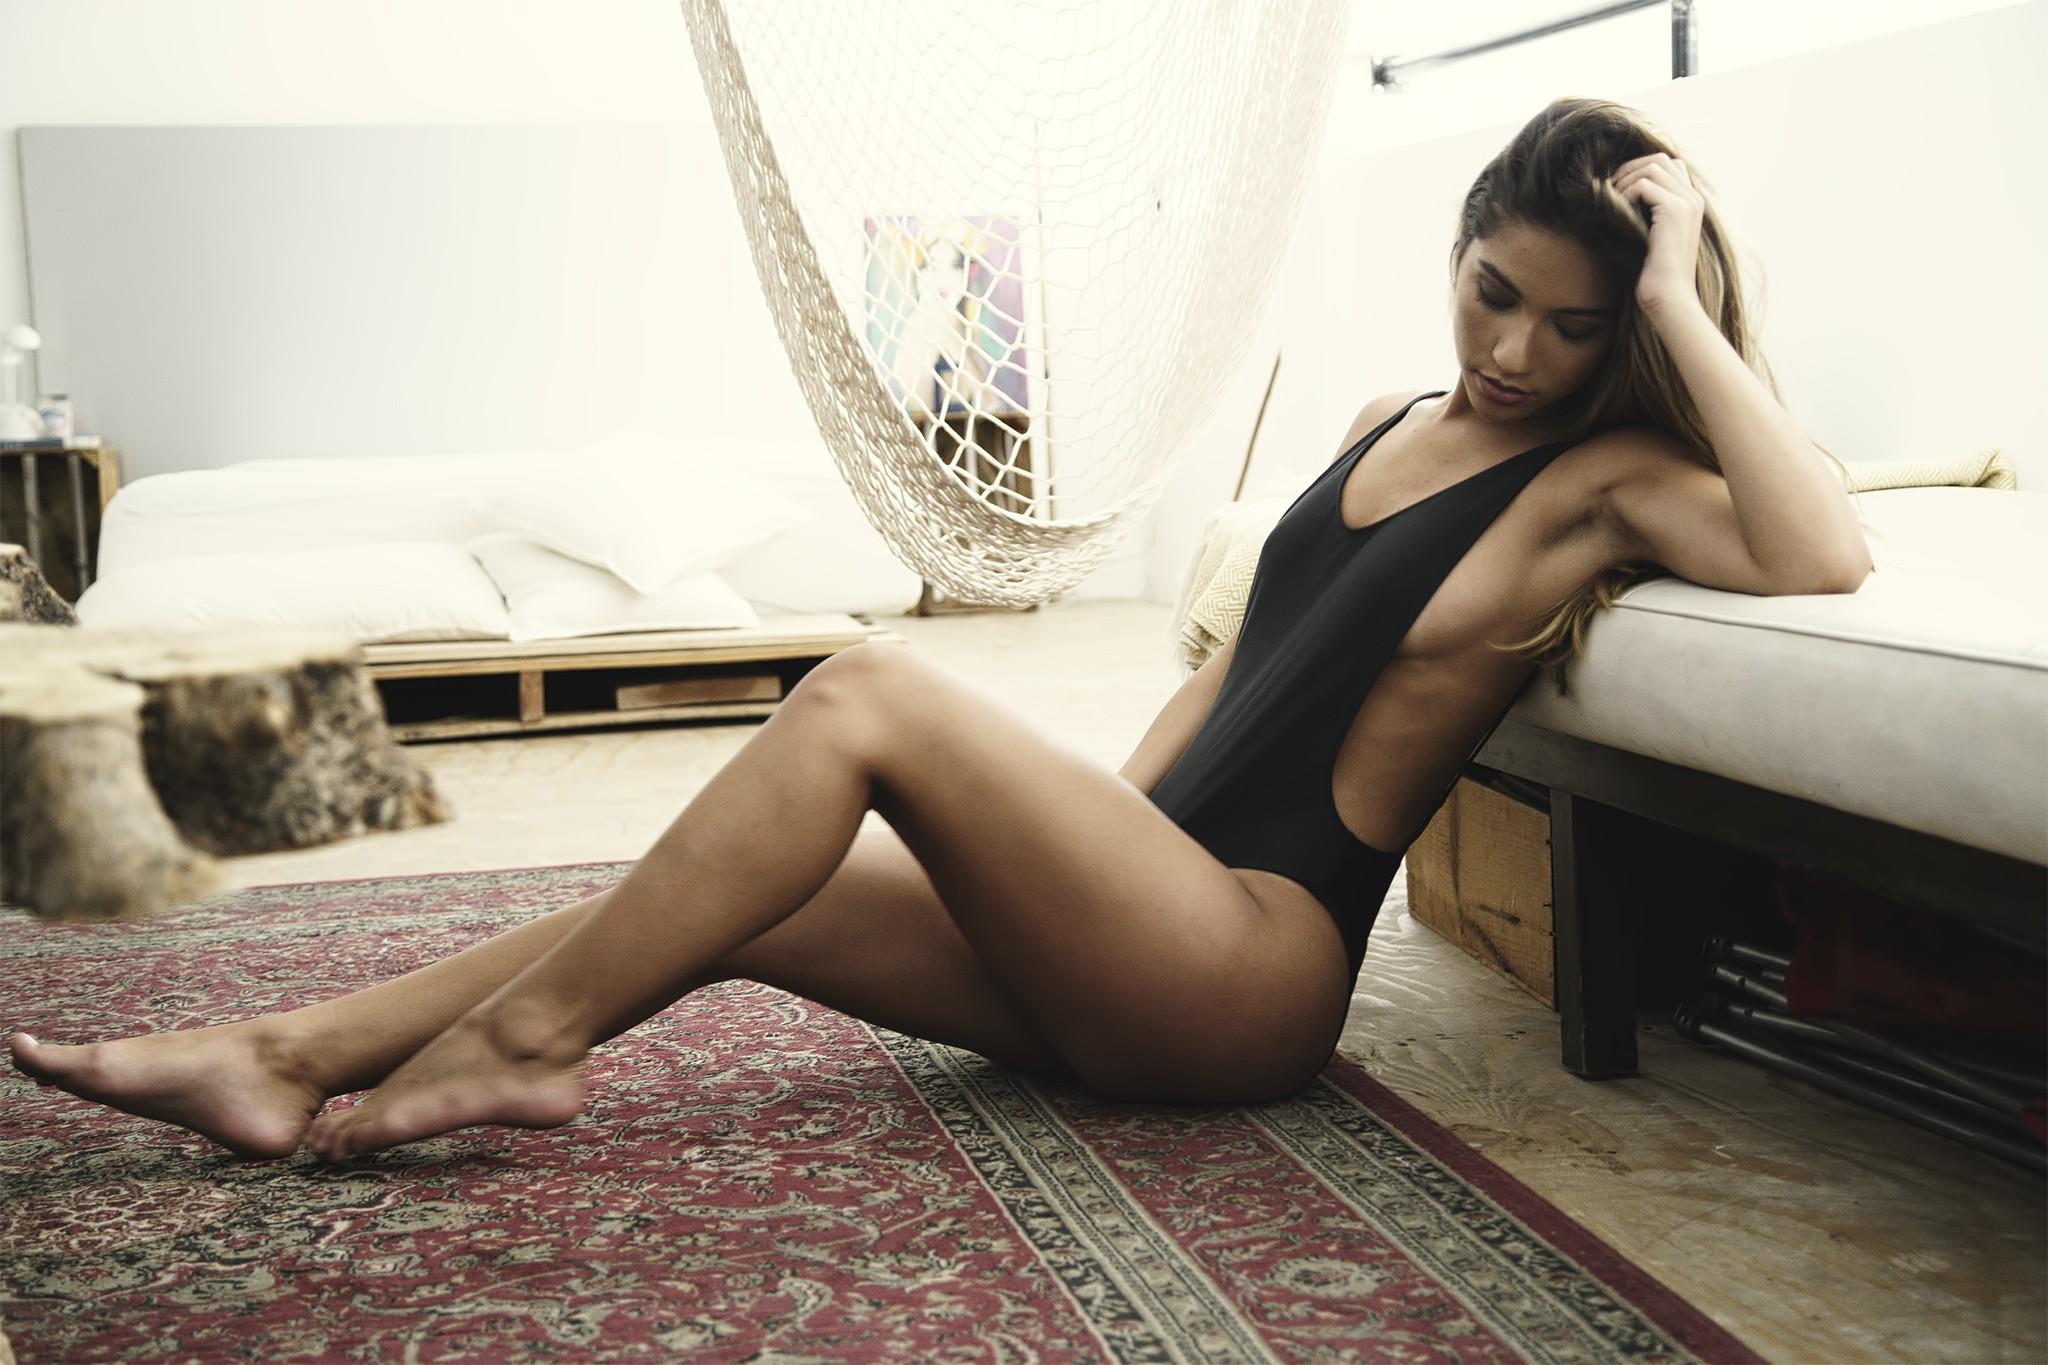 Sideboobs Erika Wheaton nudes (62 foto and video), Topless, Cleavage, Instagram, underwear 2018